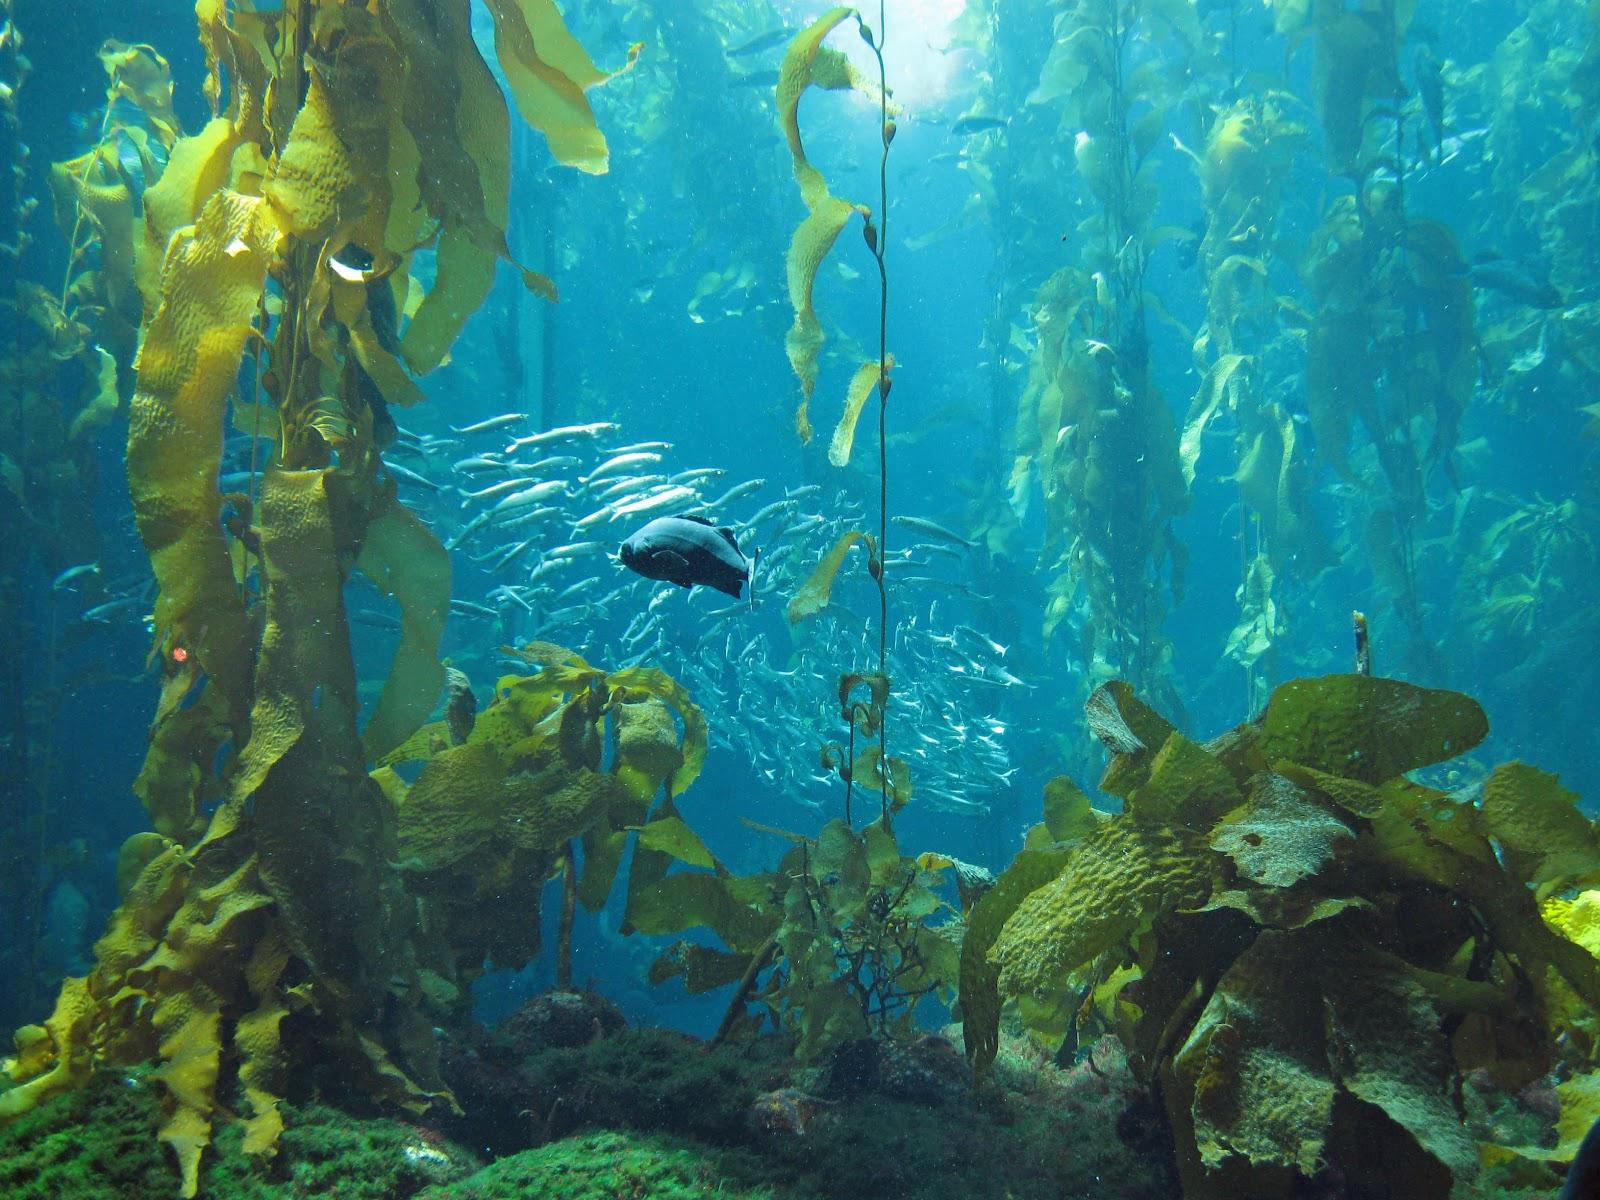 Kelp Forest Tank Monterey Bay Aquarium Shooting From